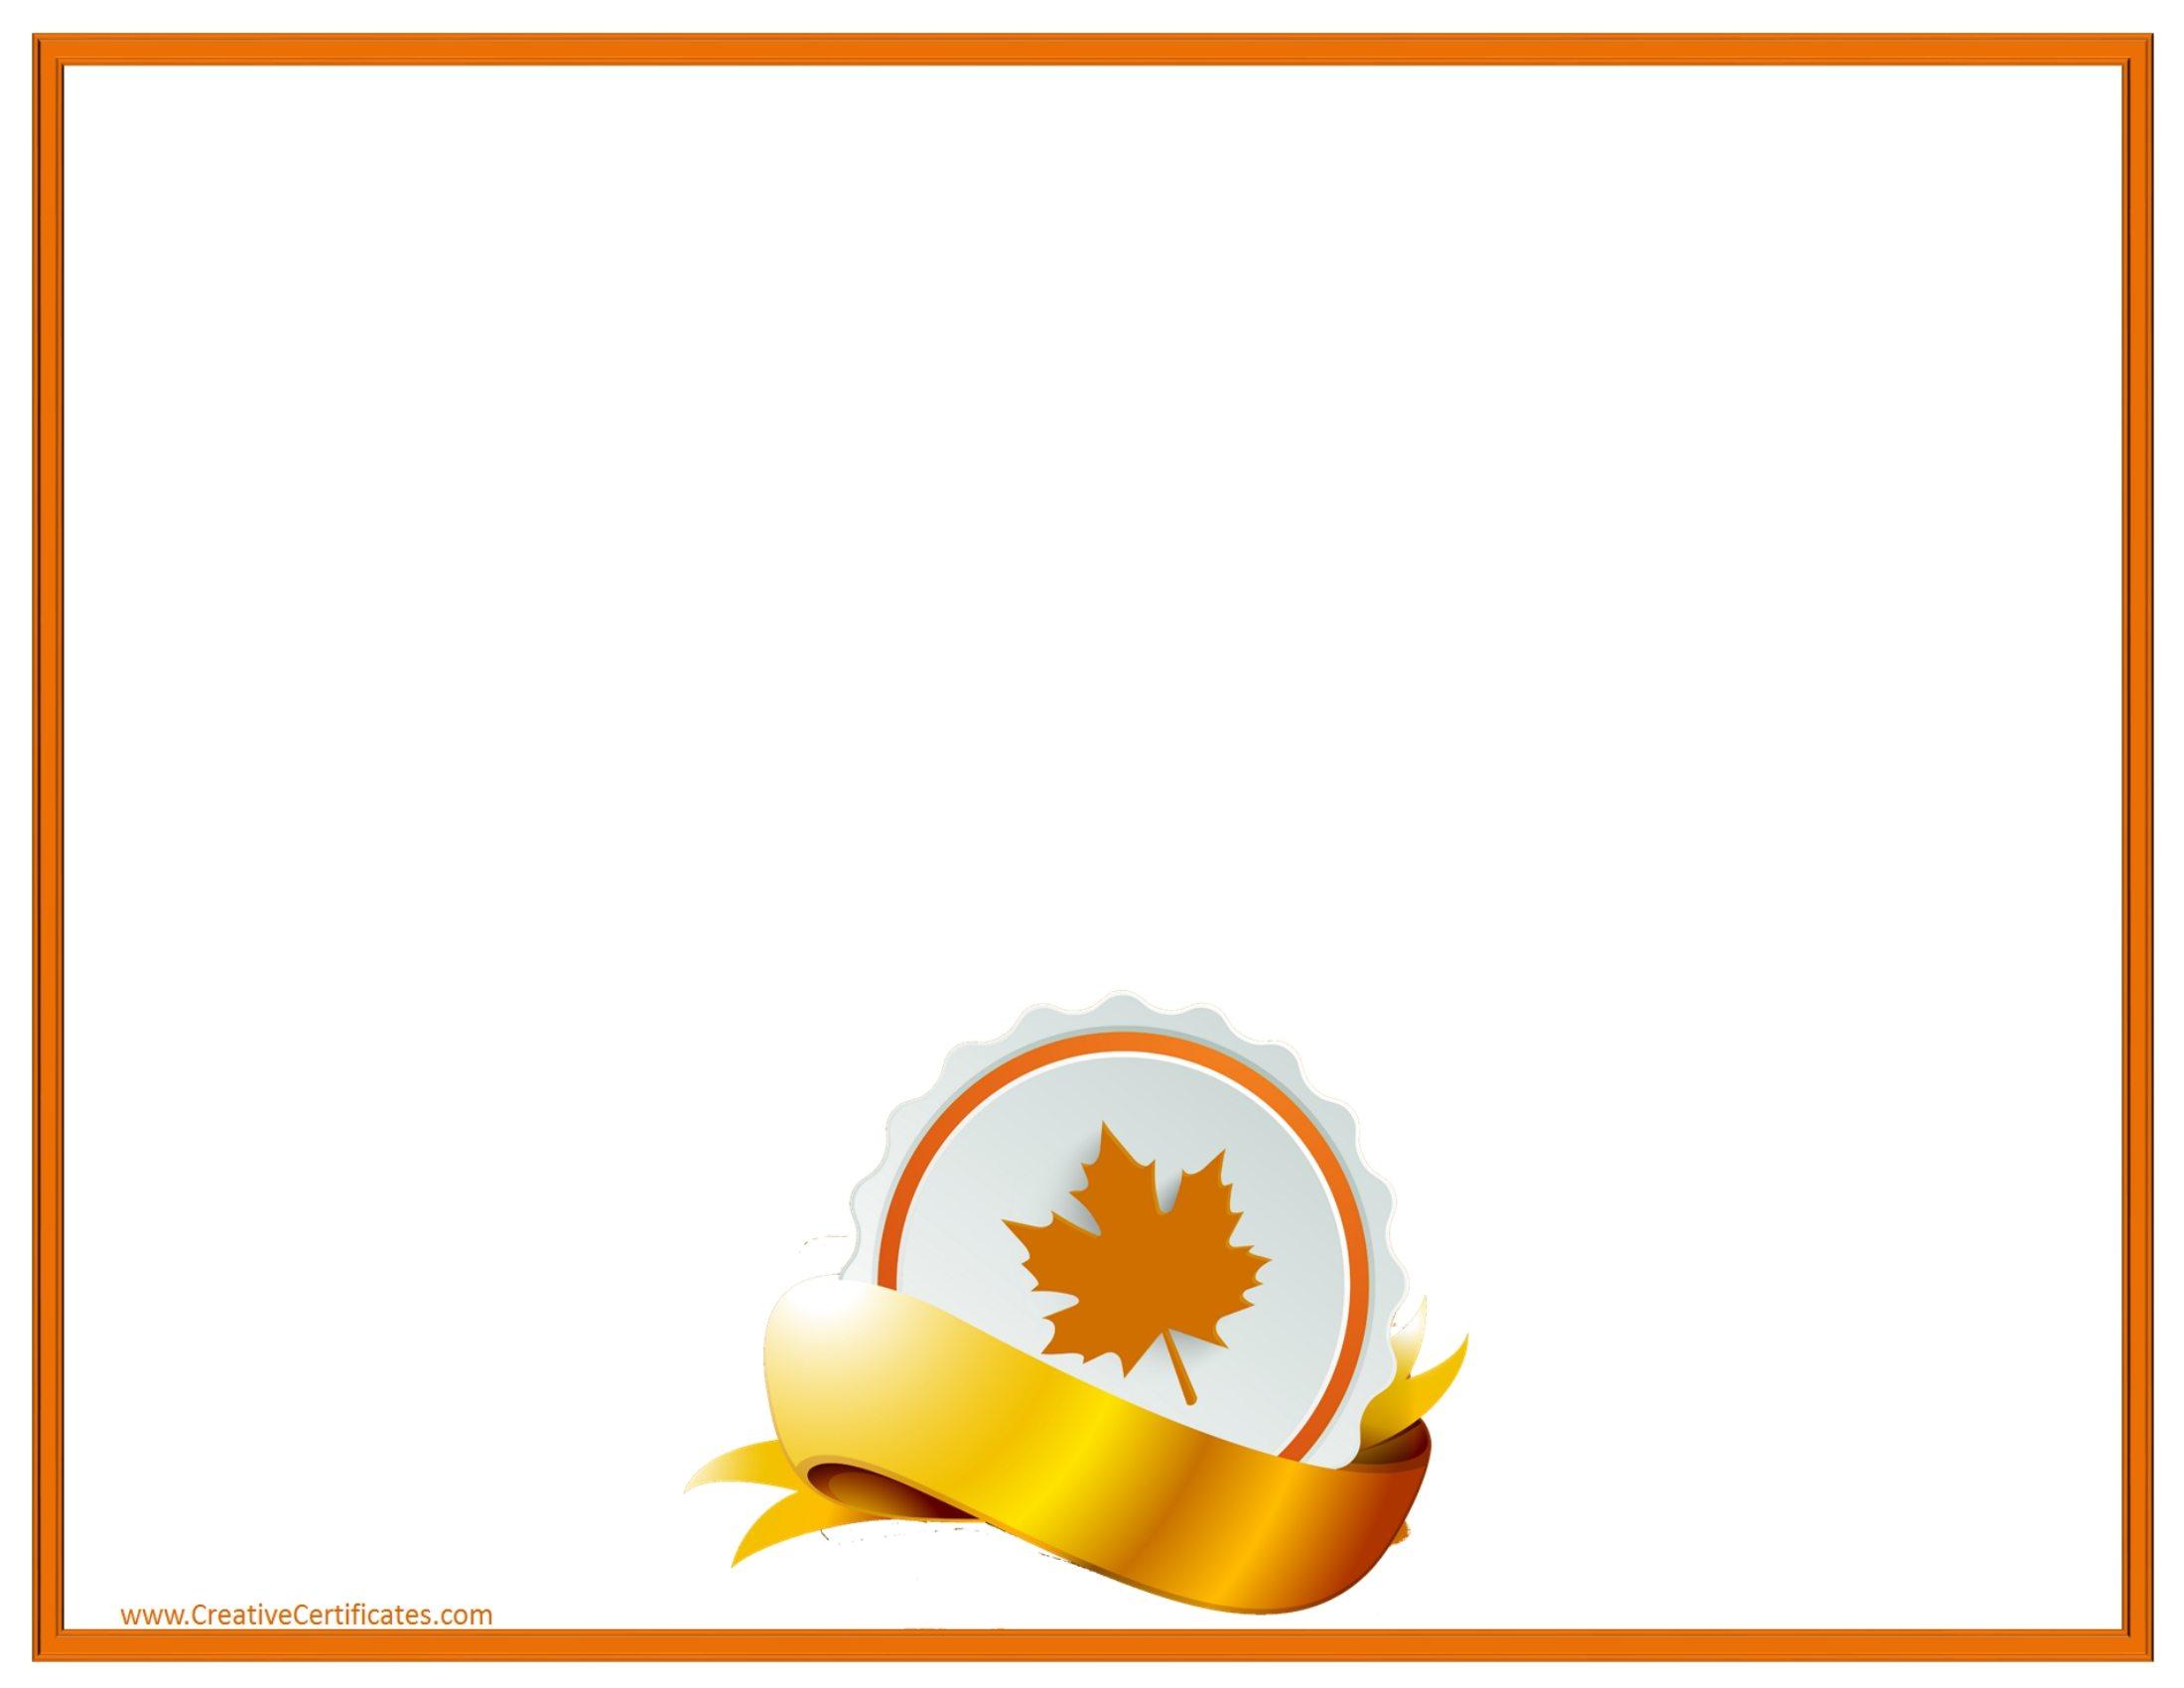 2200x1700 Free Thanksgiving Border Templates